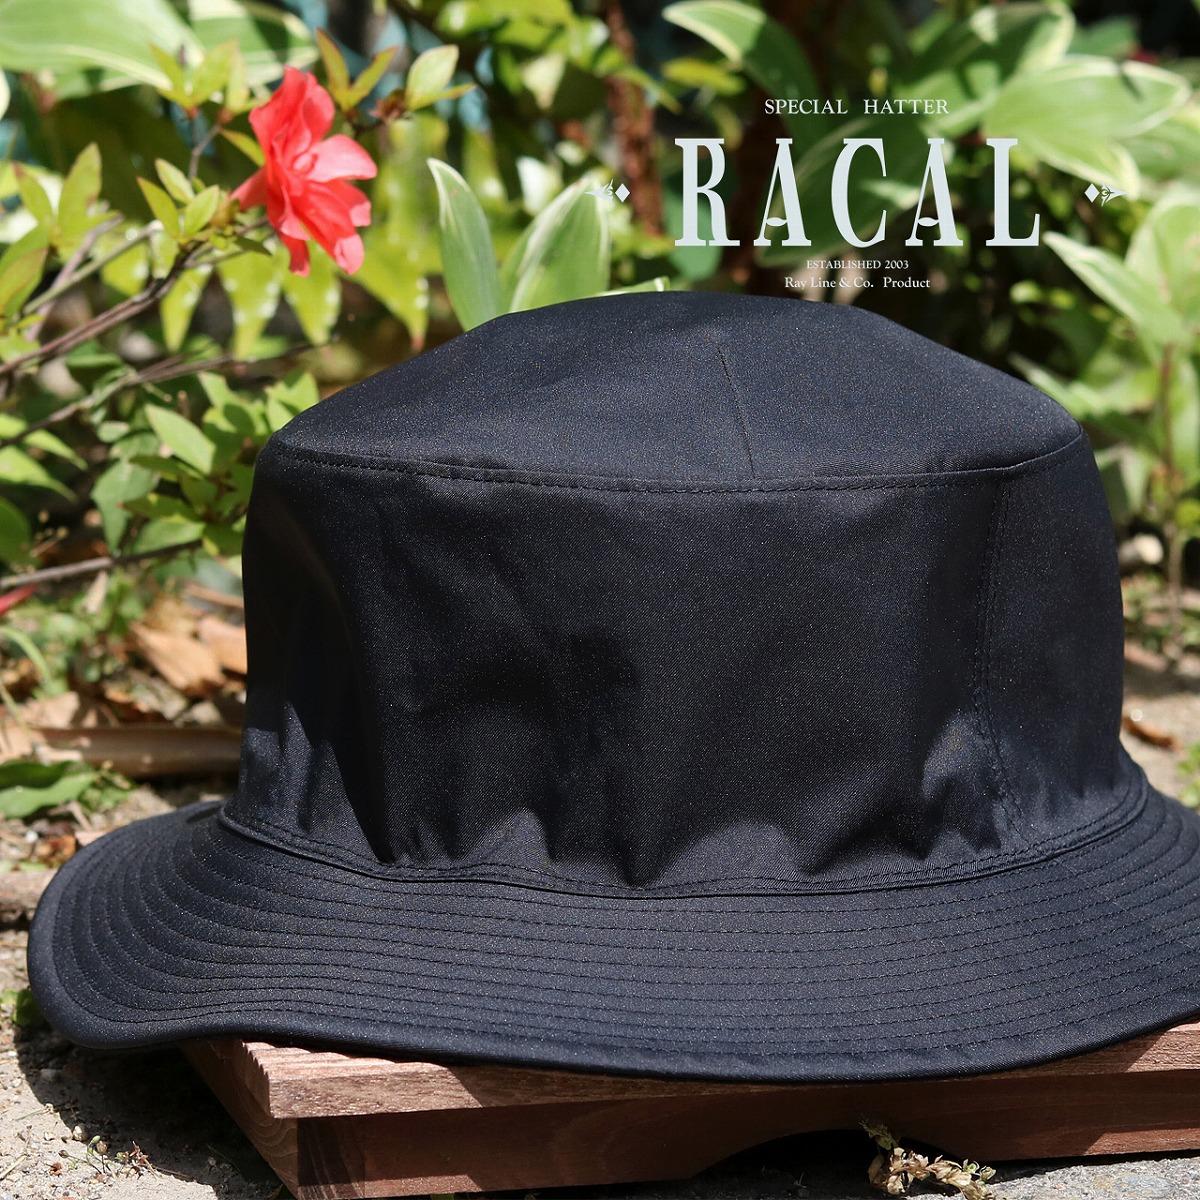 fcfaae8f391 Shin pull Sakha re-hat reversible hat hat men brand natural safari hat men  racal waterproofing   black black  bucket hat  hat Lady s 58cm 59cm  outdoors ...